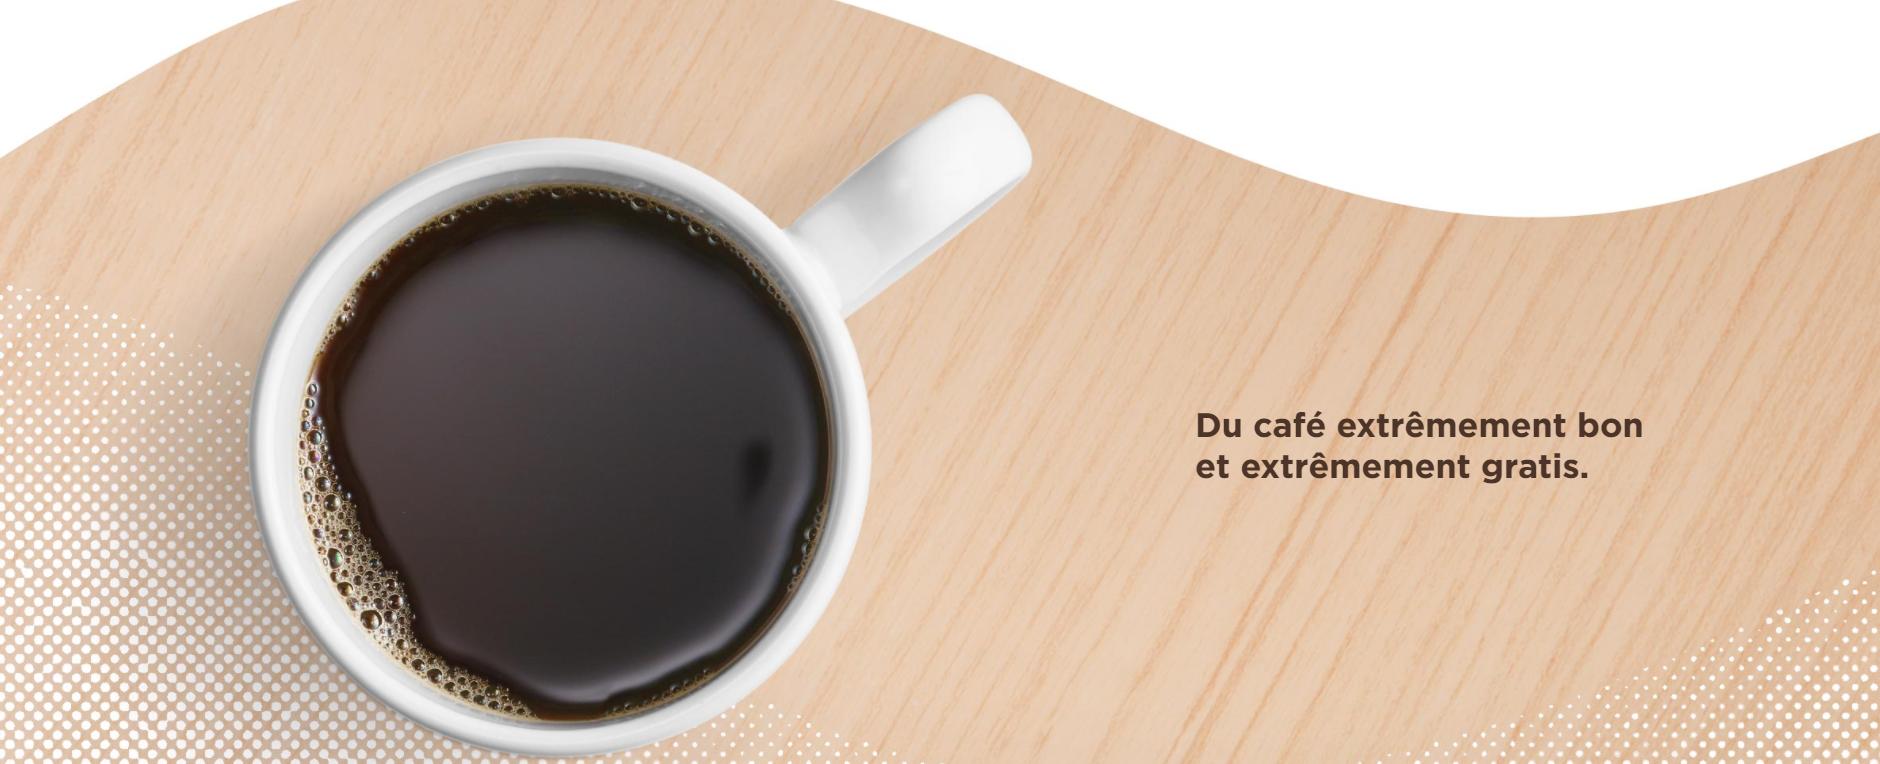 cafe aw gratuit